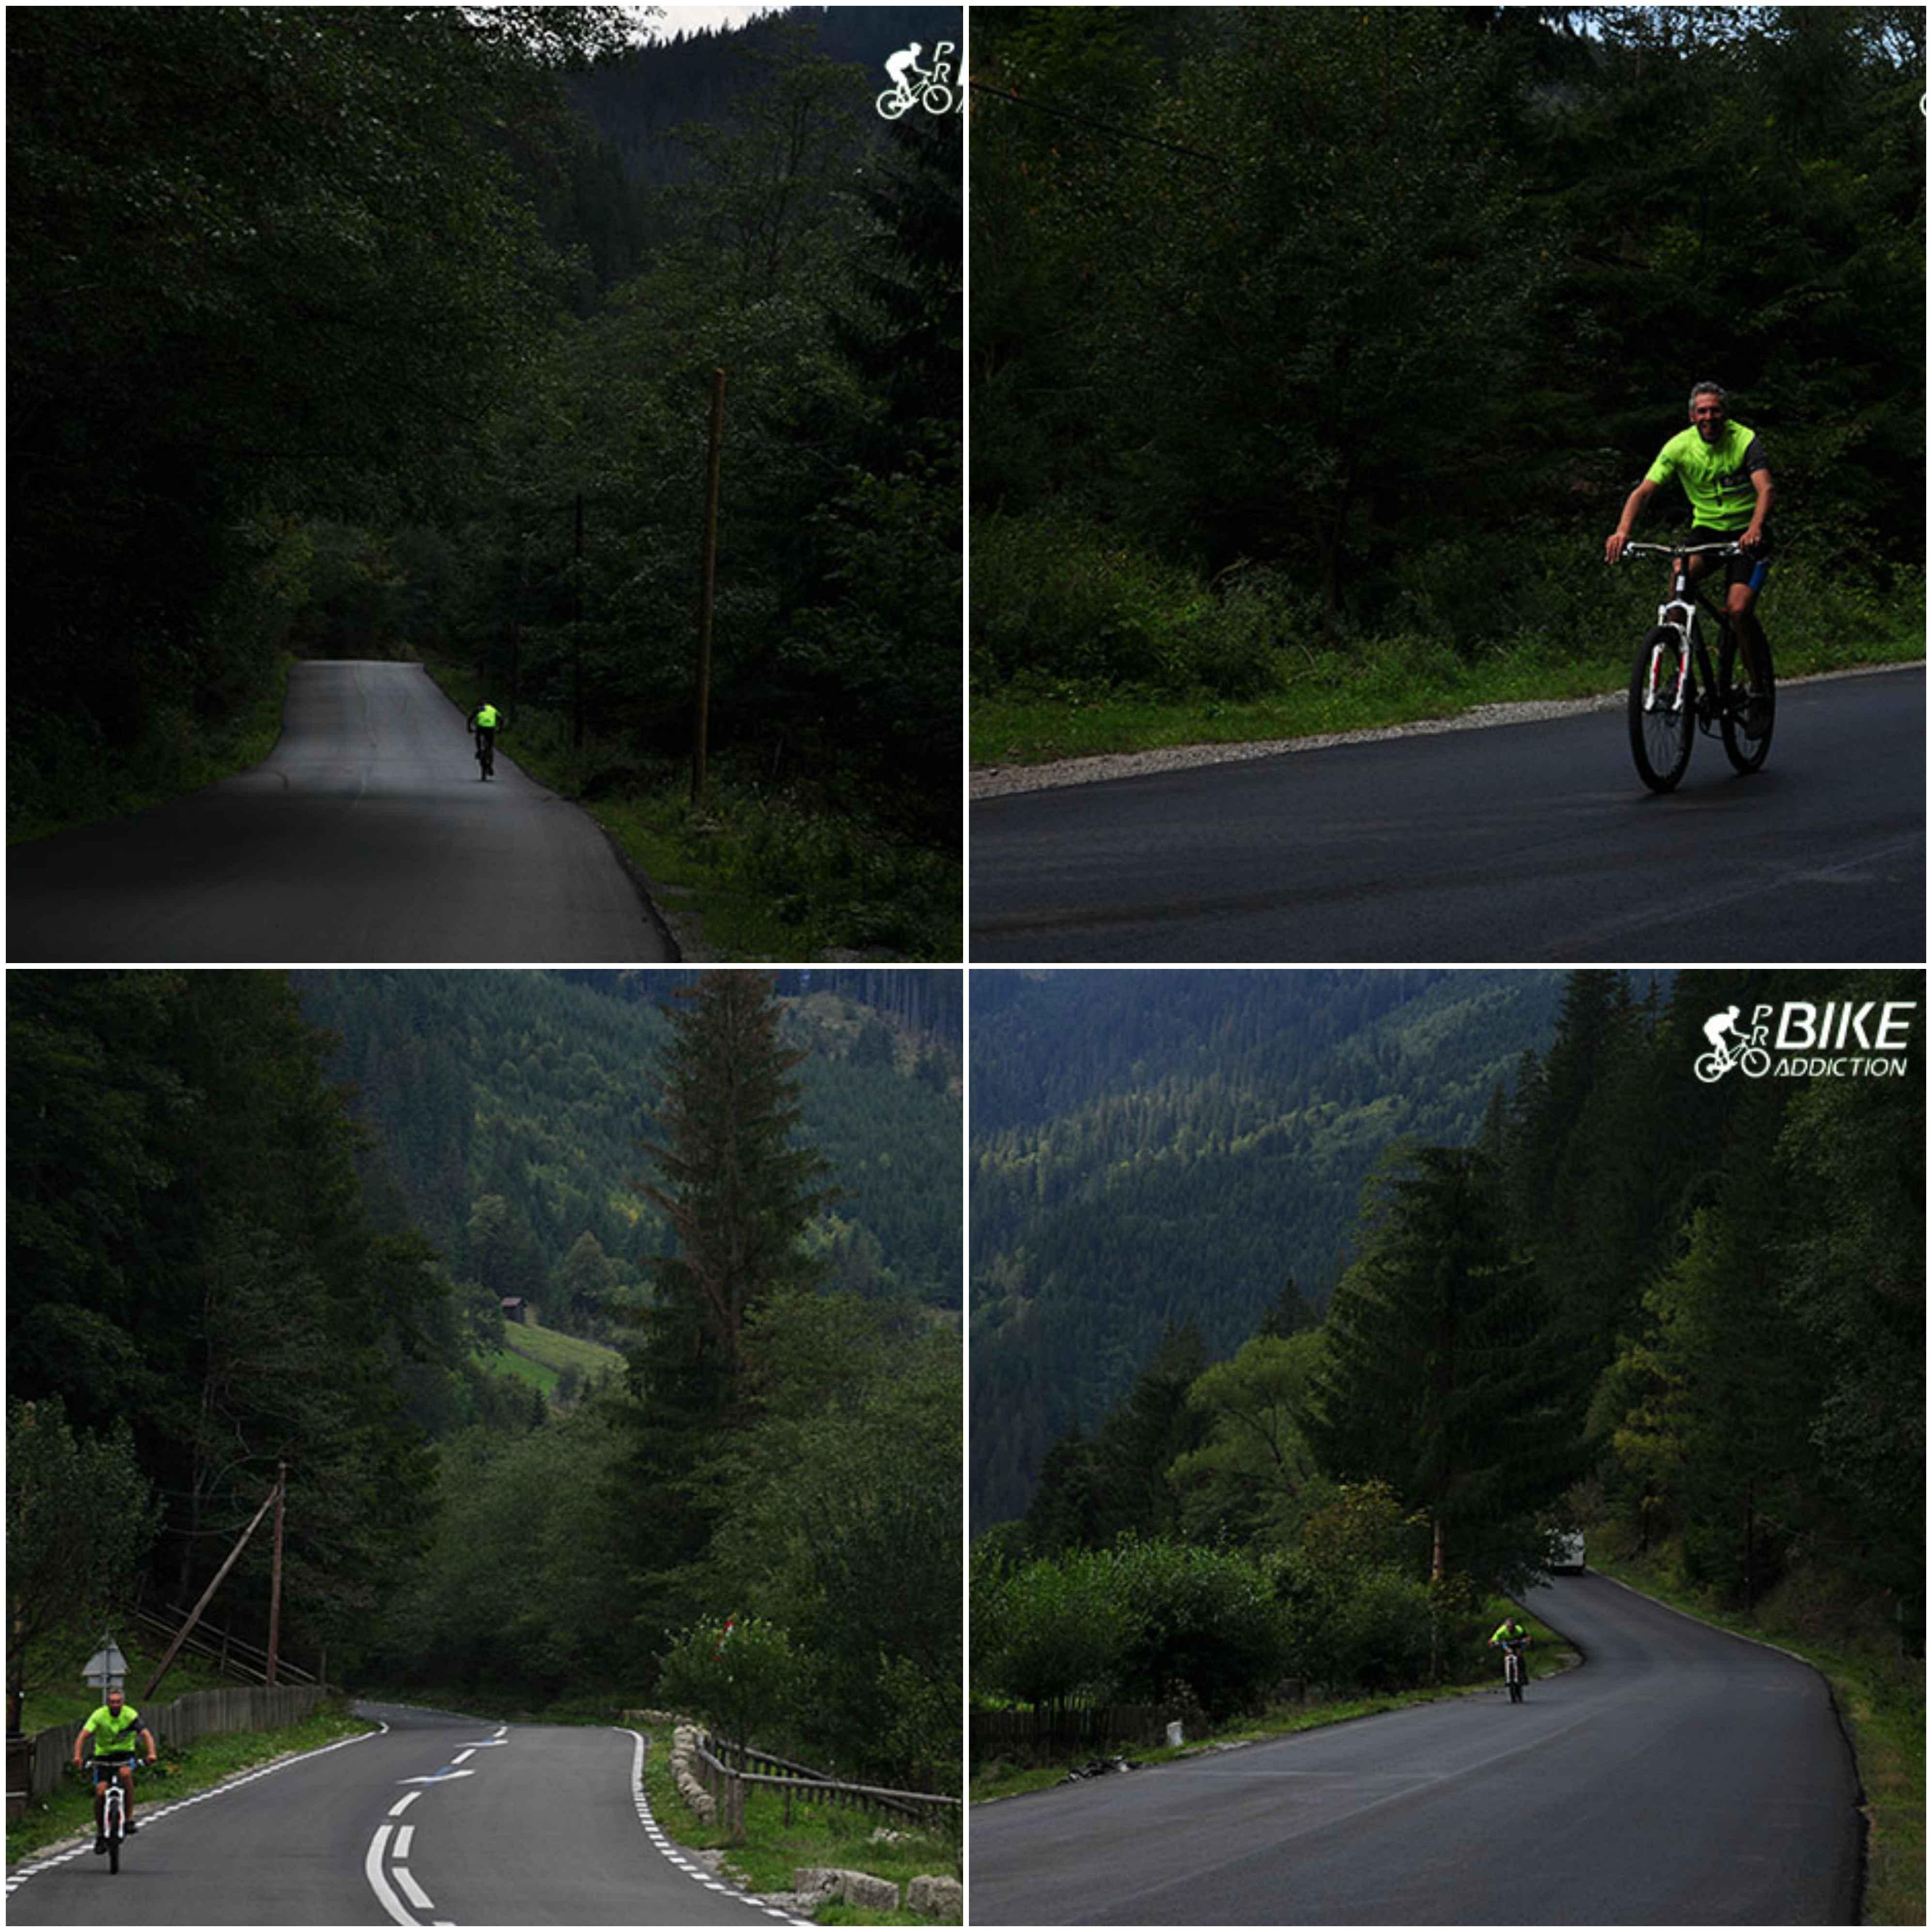 probikeaddiction cicloturism valea bistritei 18